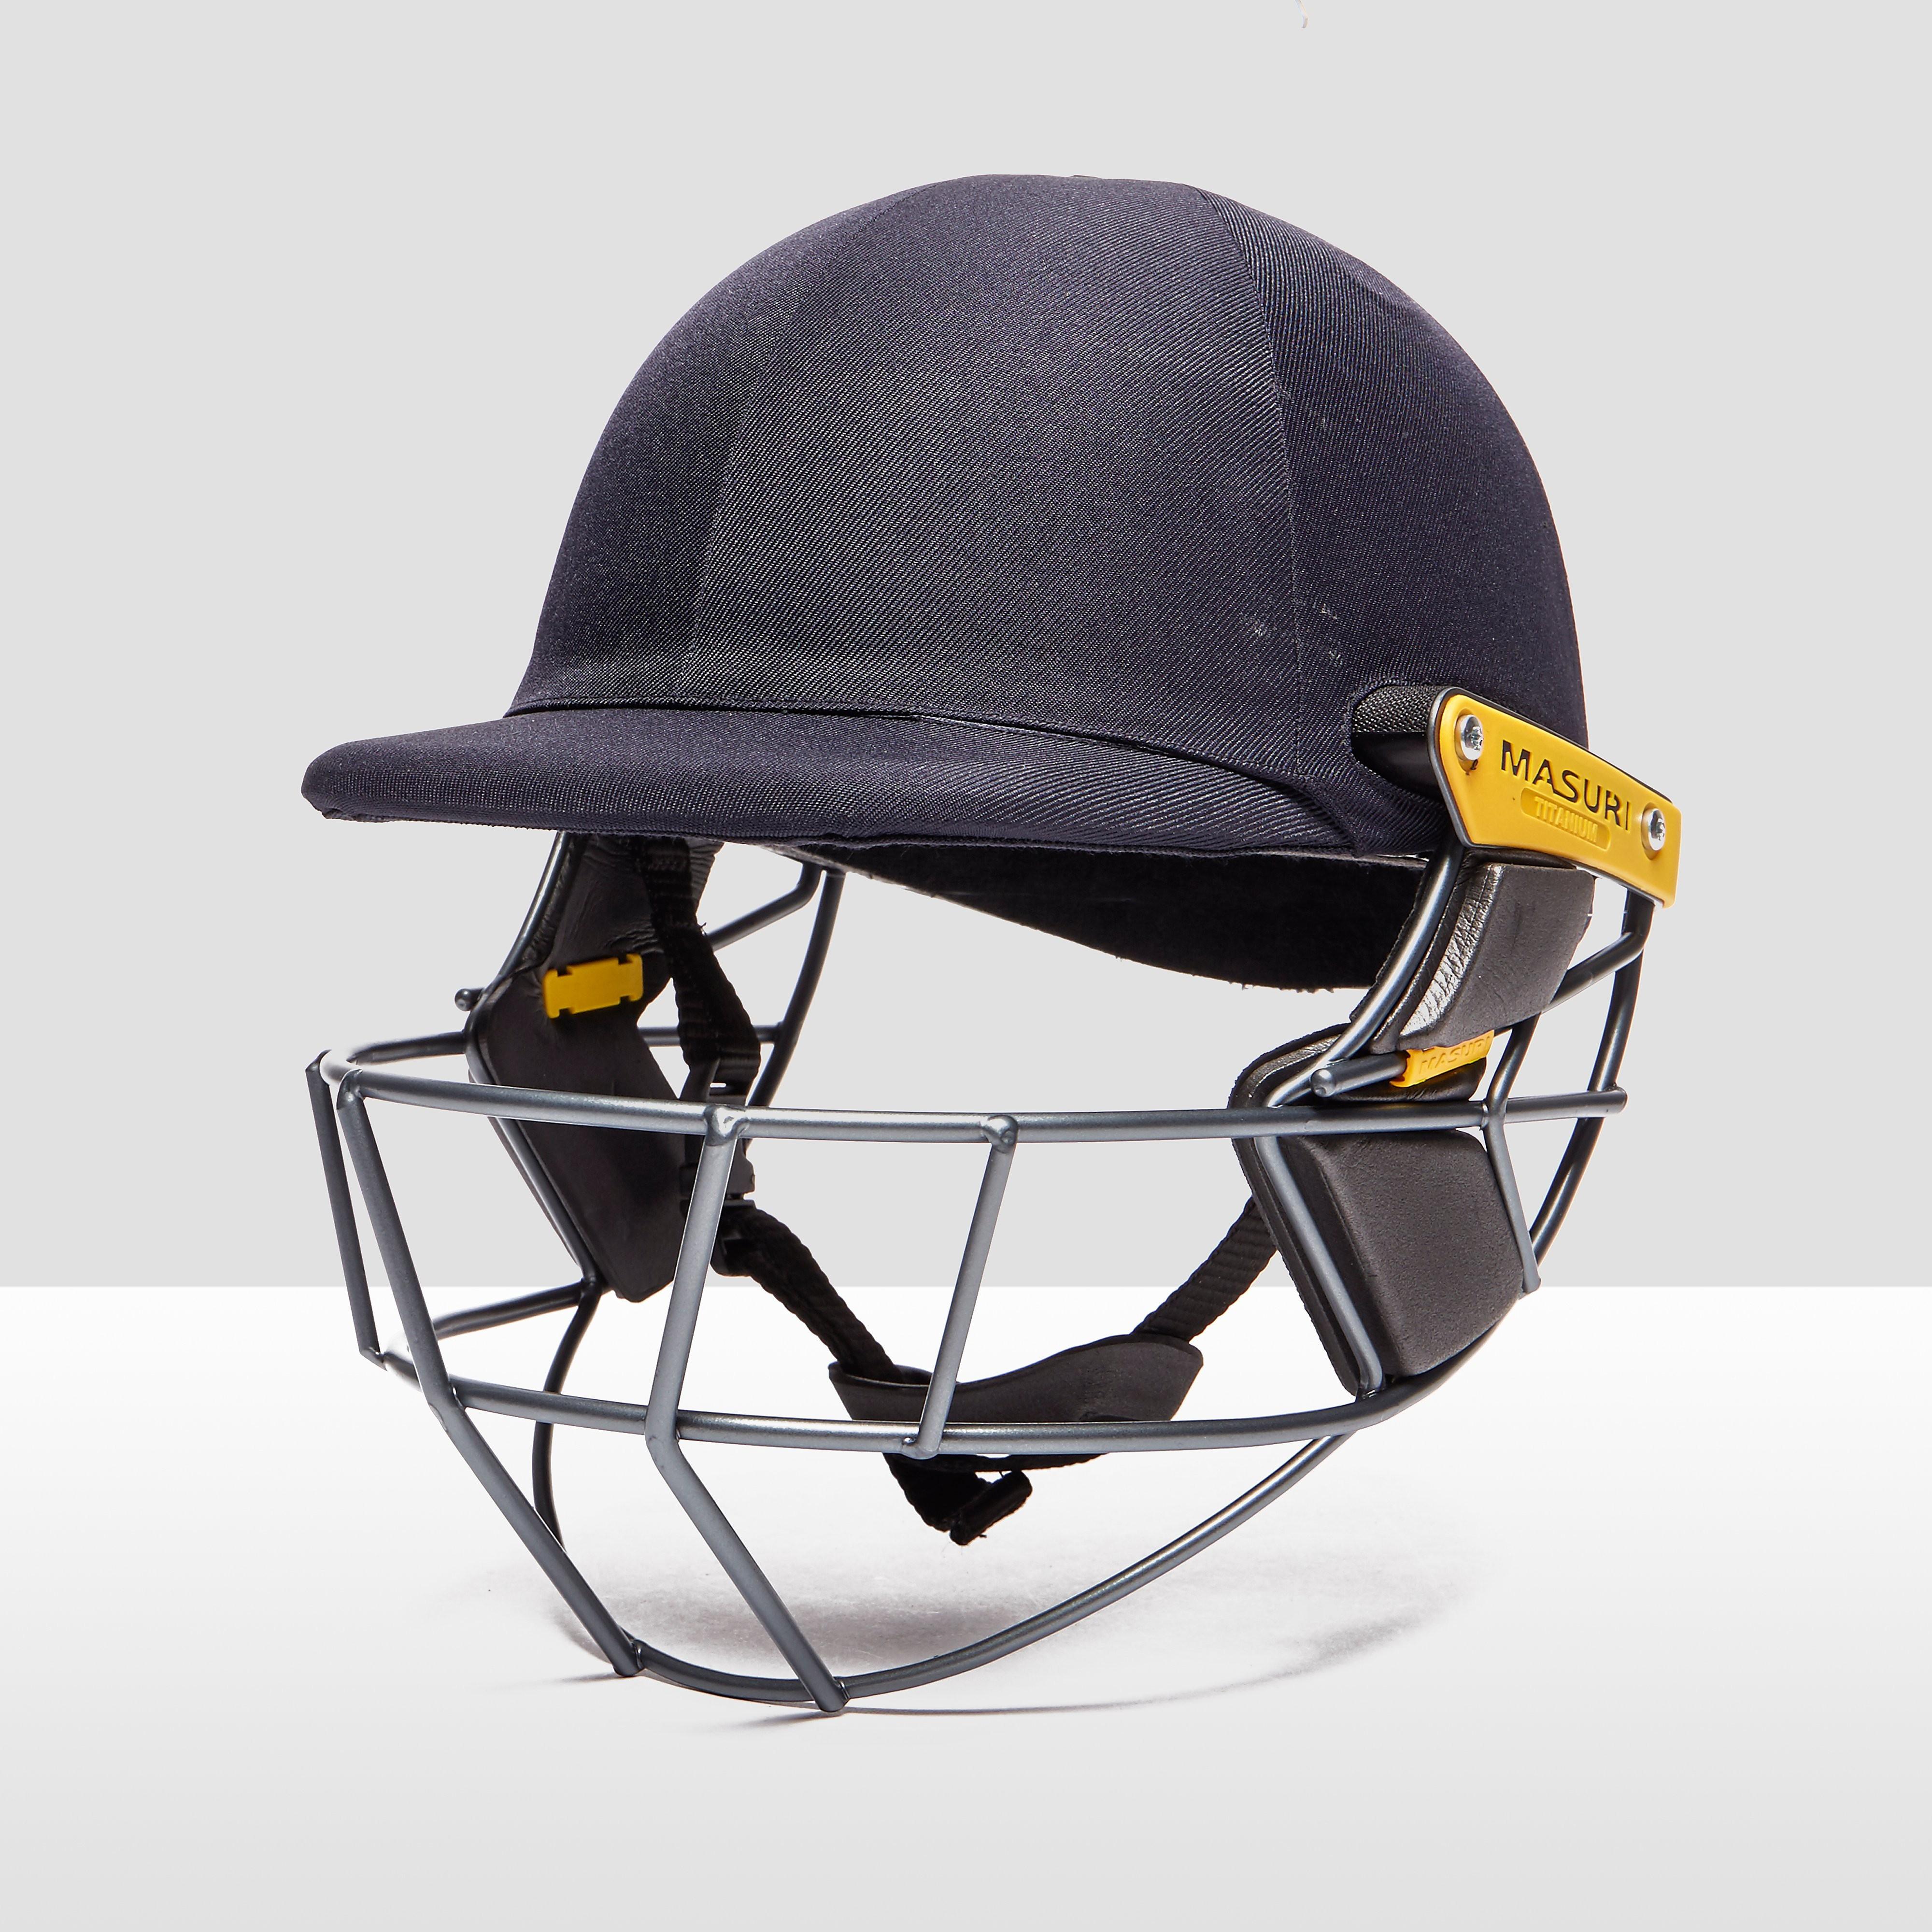 Masuri Original Series Mk2 Test Helmet